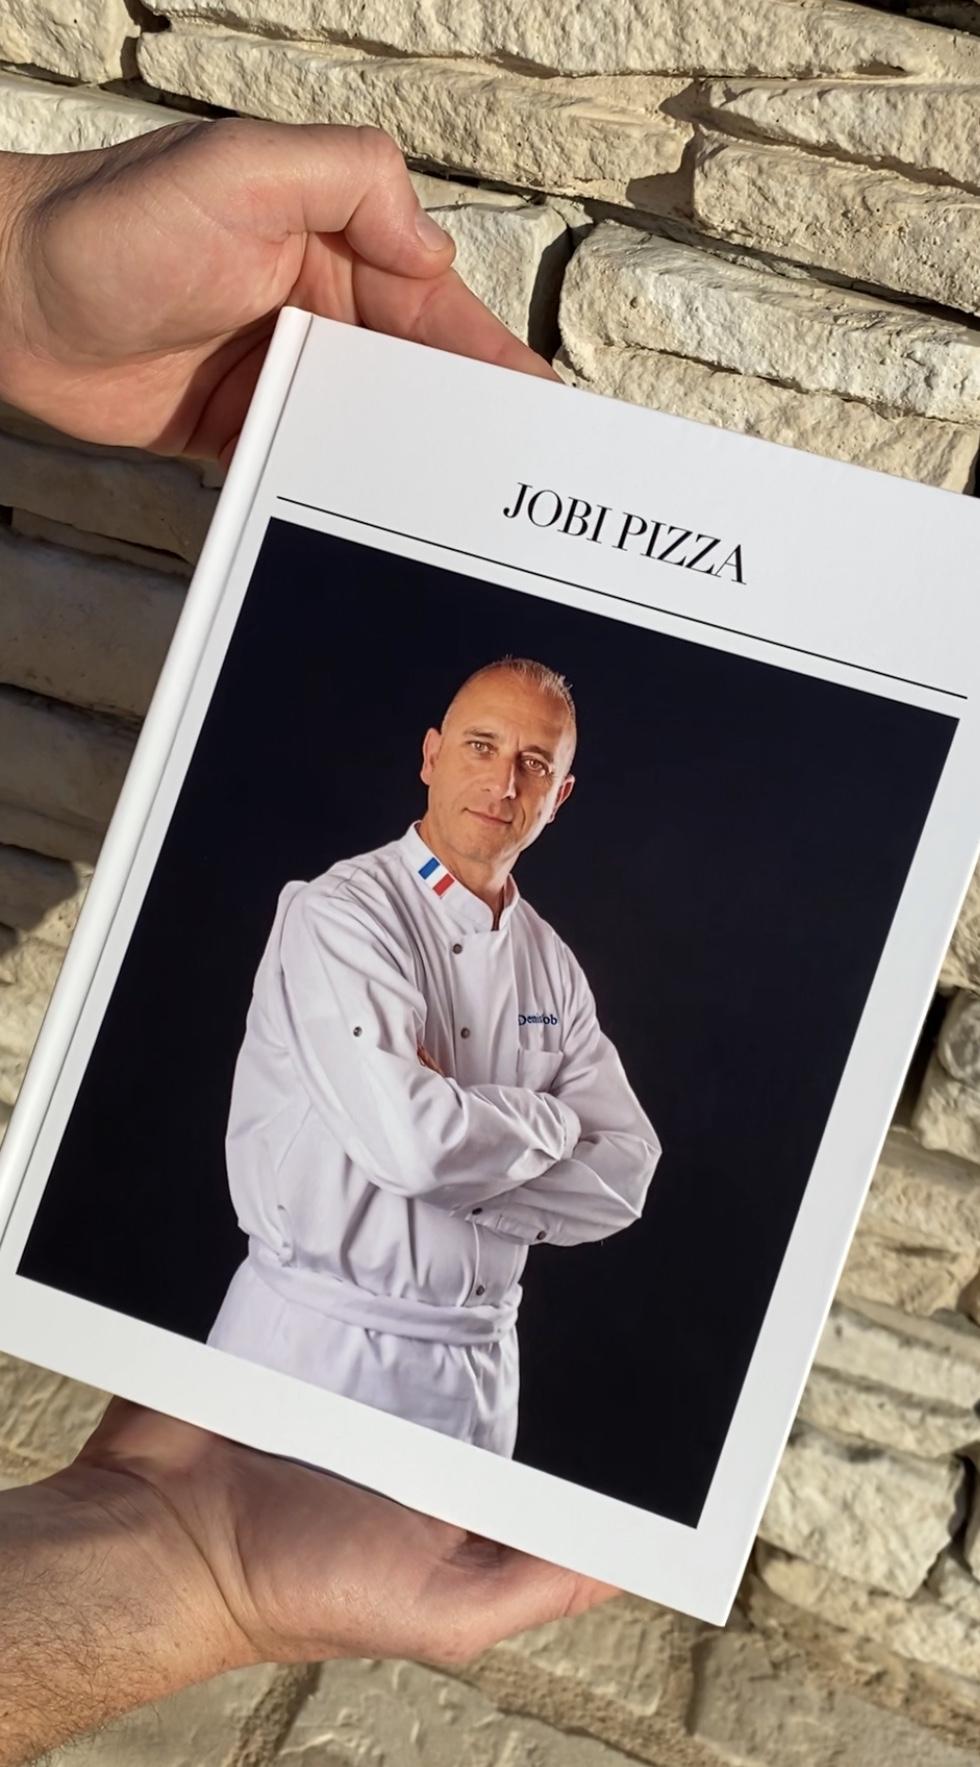 un livre JOBI PIZZA & Denis JOB  07d27d10